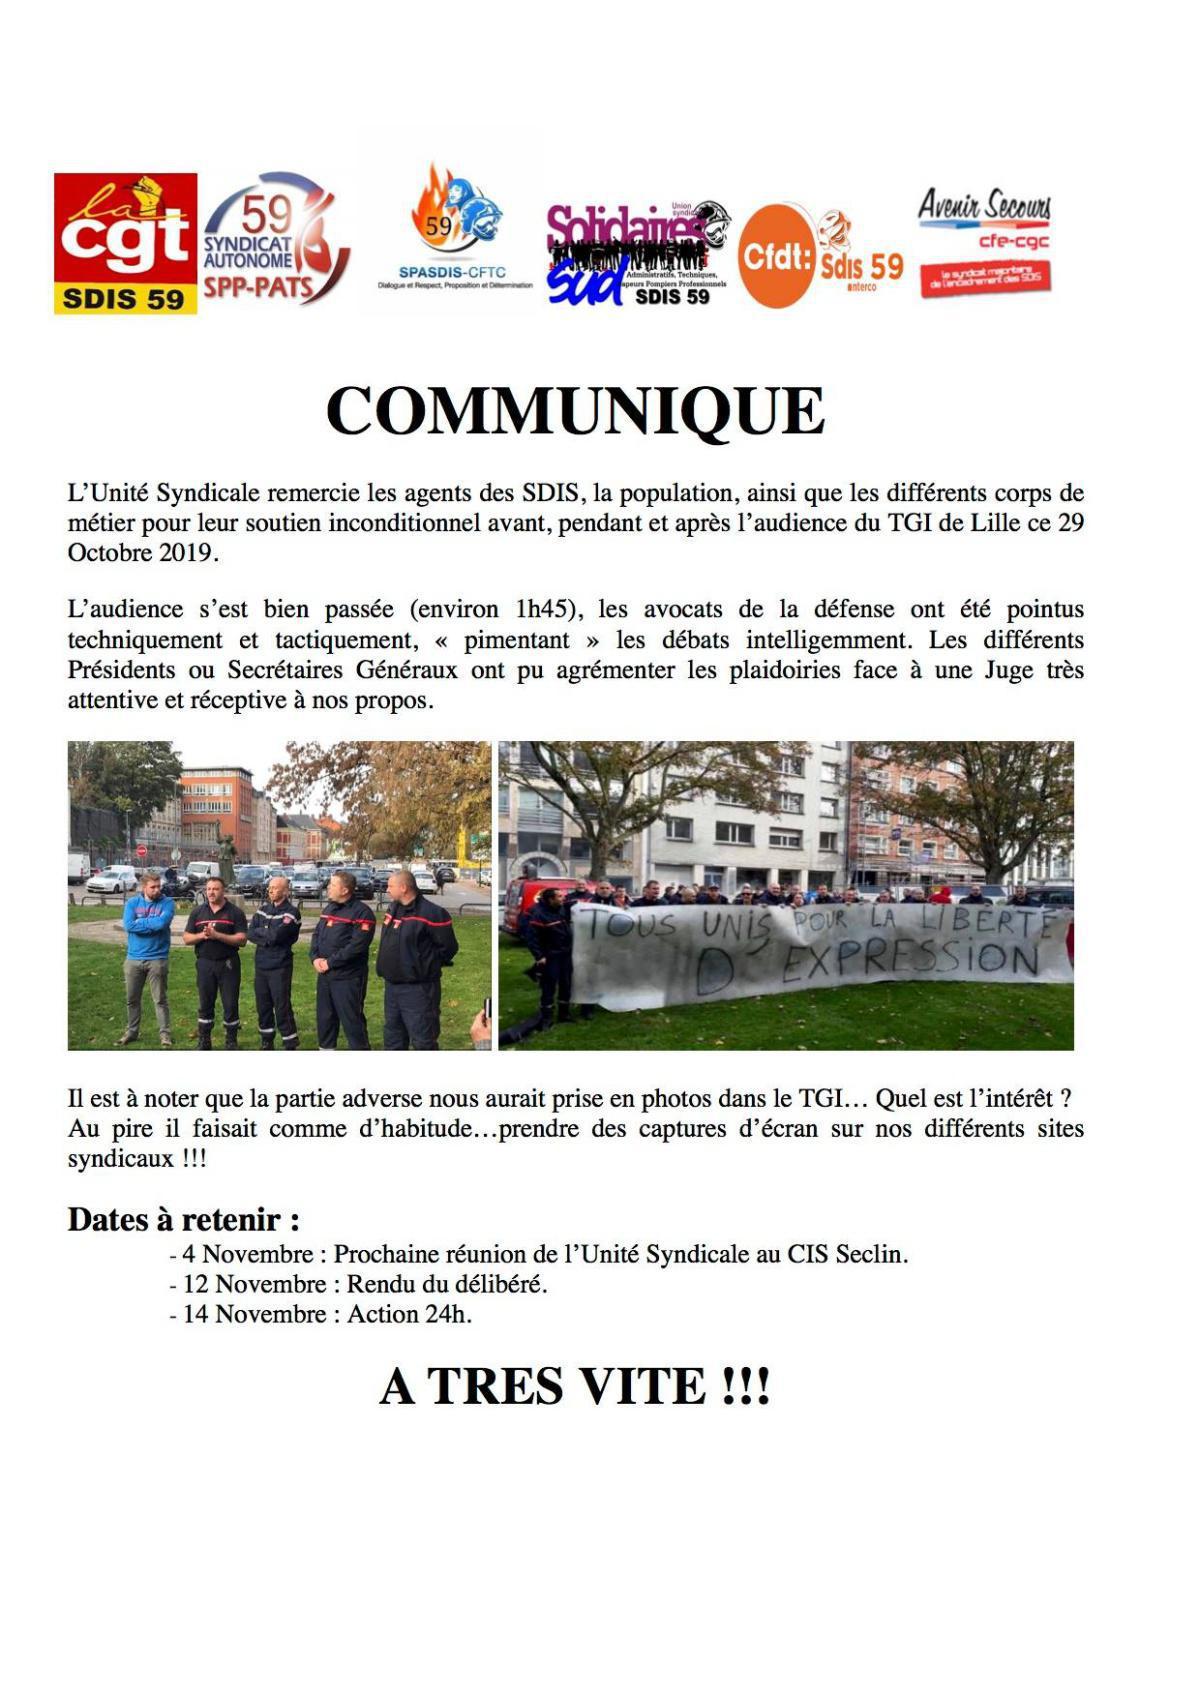 TIG de Lille ce 29 Octobre 2019